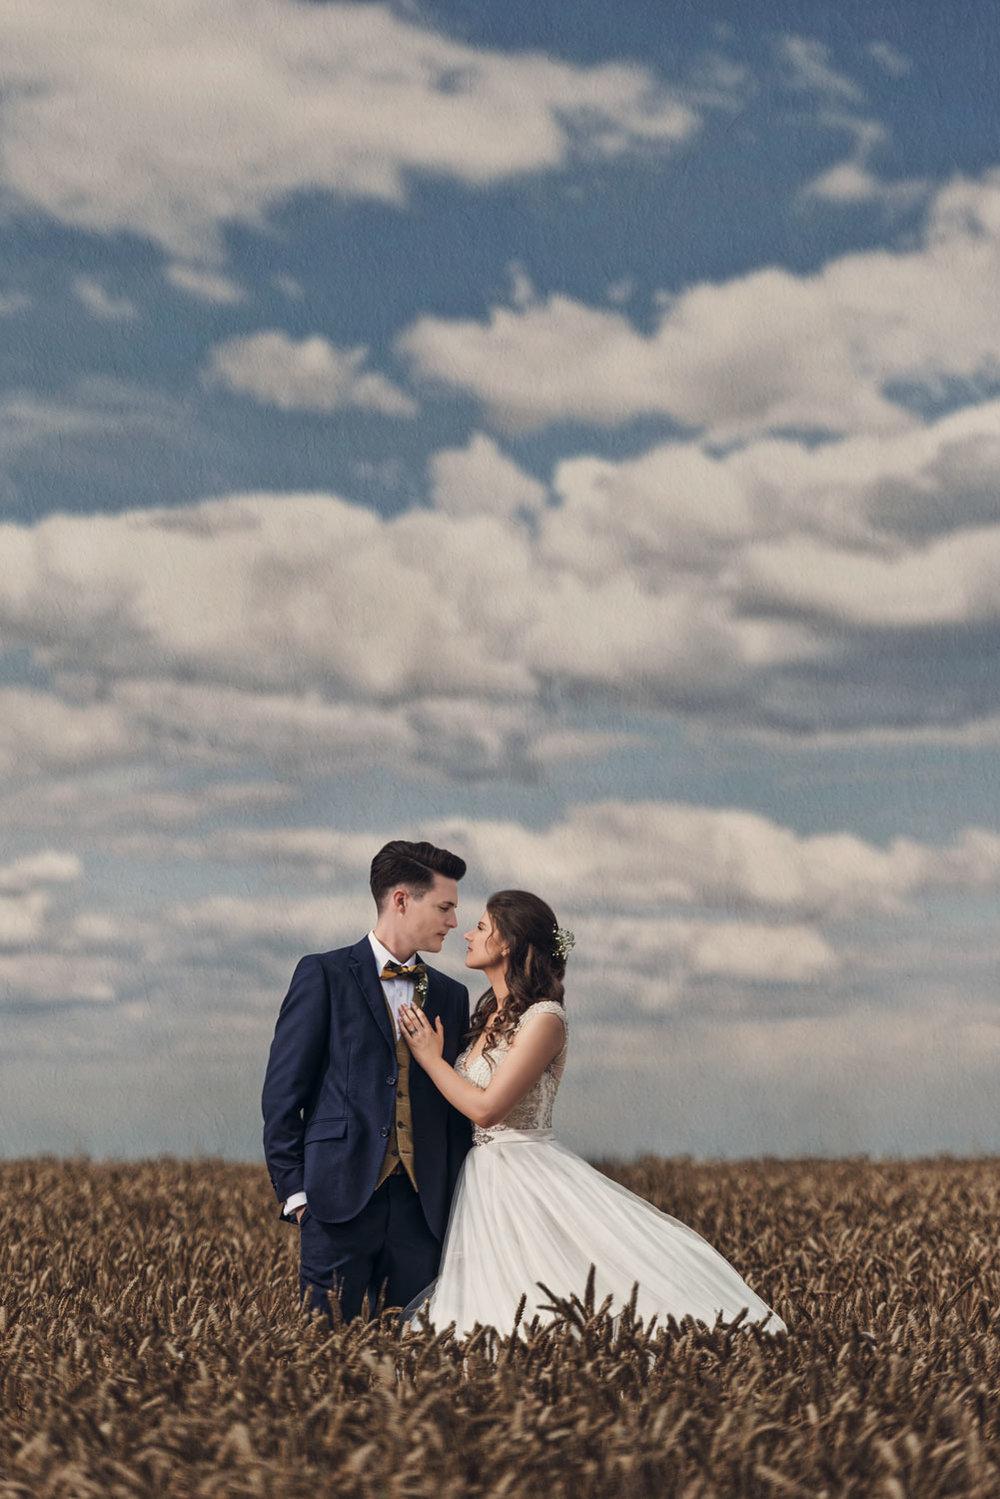 Couple pose at Blackwell Grange wedding venue